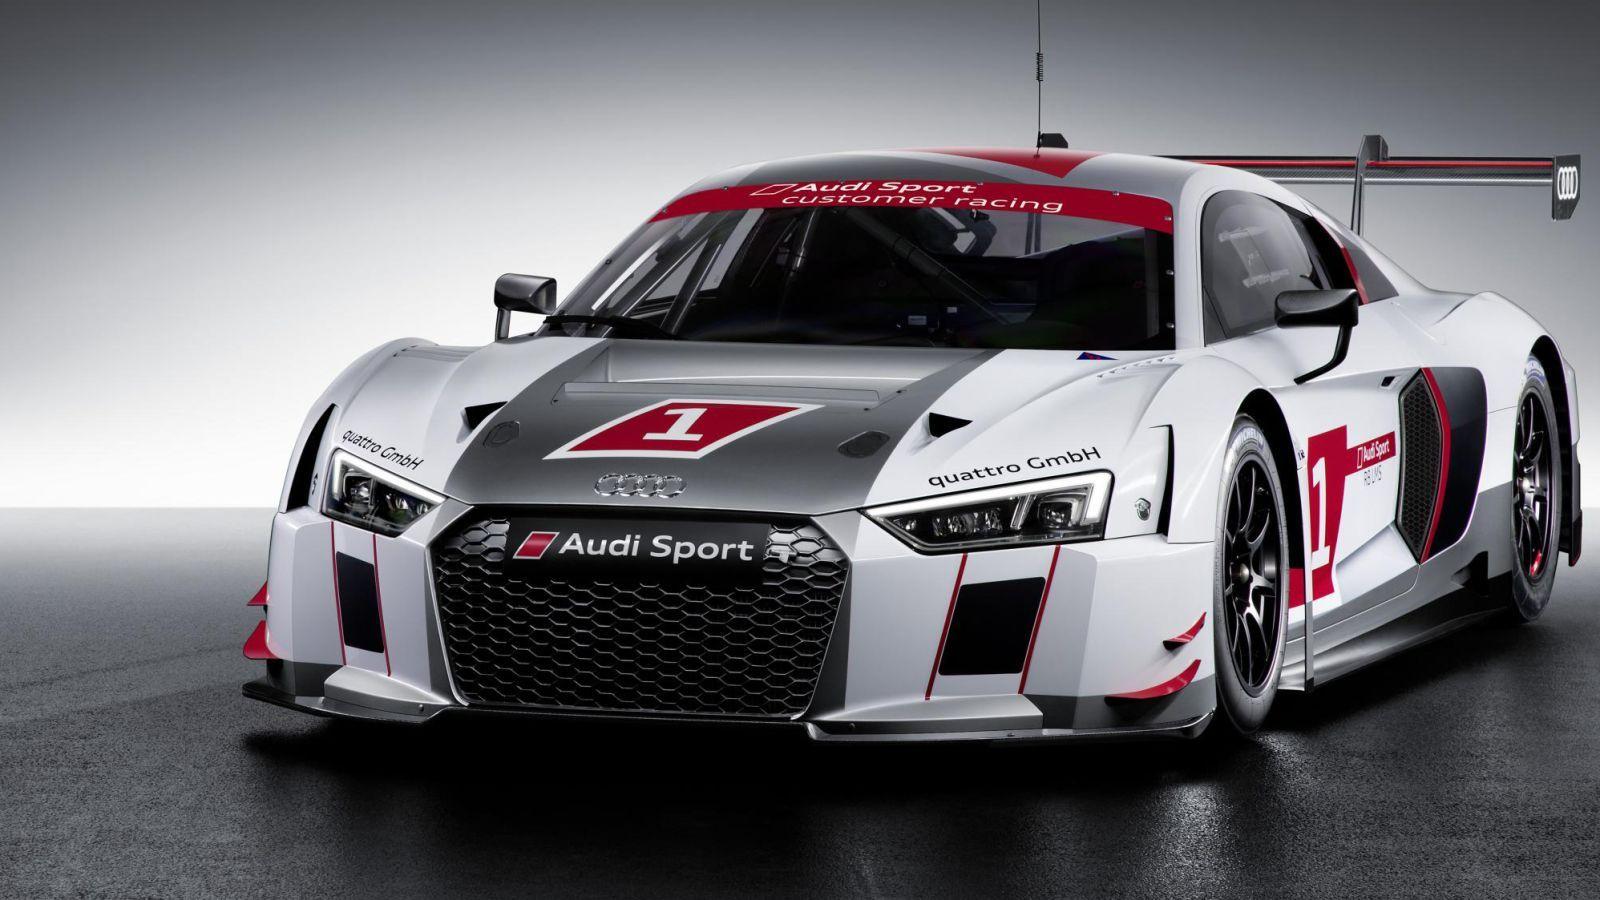 Resultado De Imagem Para Audi R8 Audi R8 Audi Audio De Automoviles